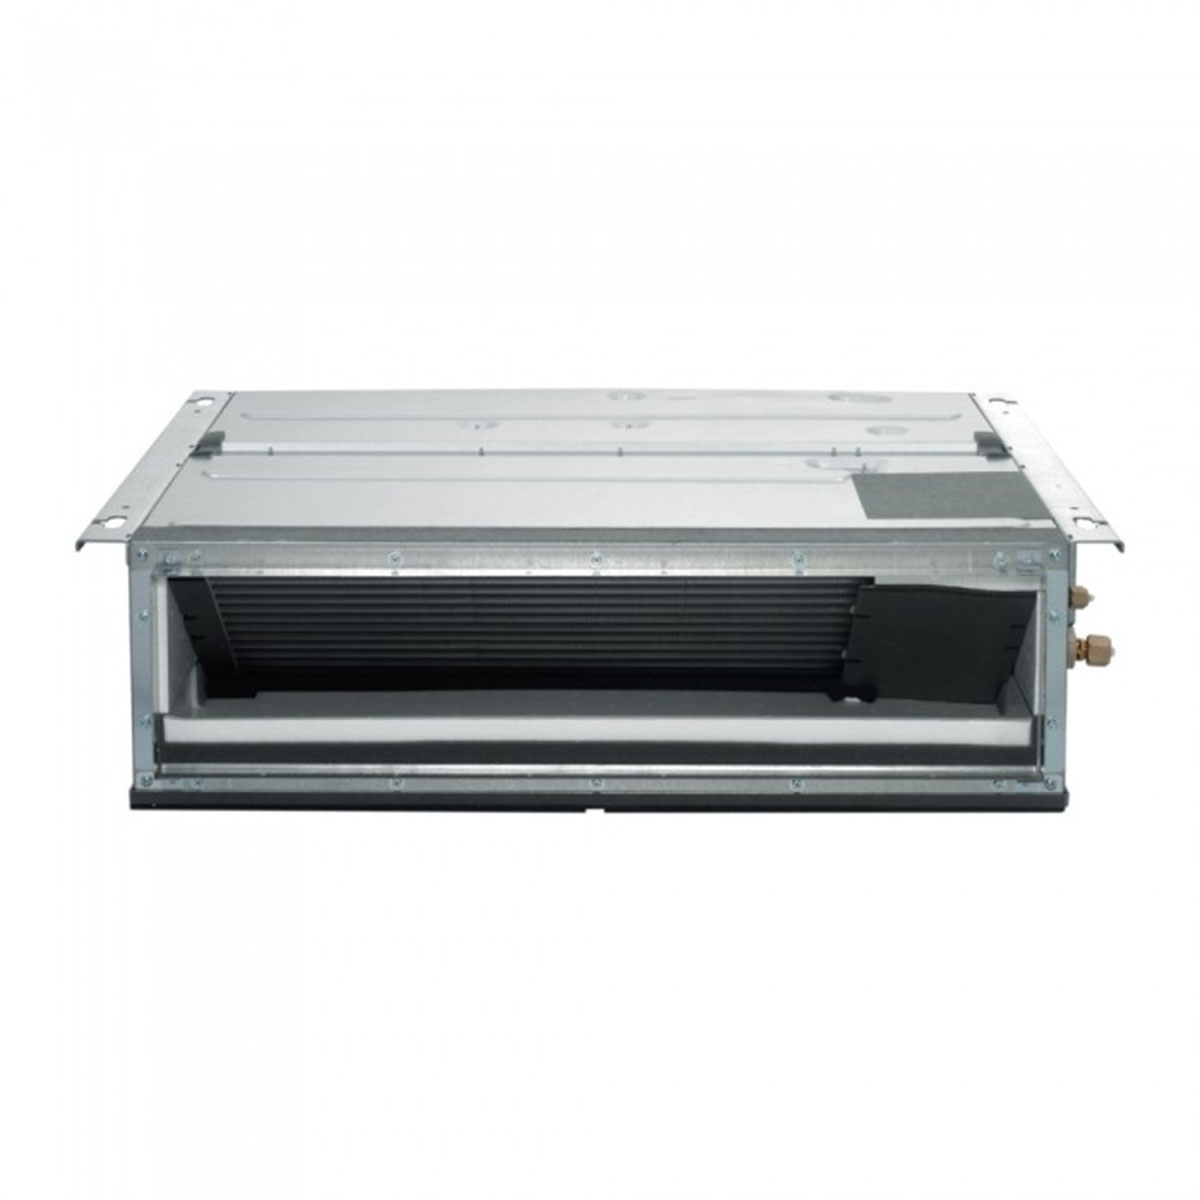 Unitate interna tip duct Dakin BLUEVOLUTION SkyAir Alpha-series Inverter,R23, Clasa A+ 10